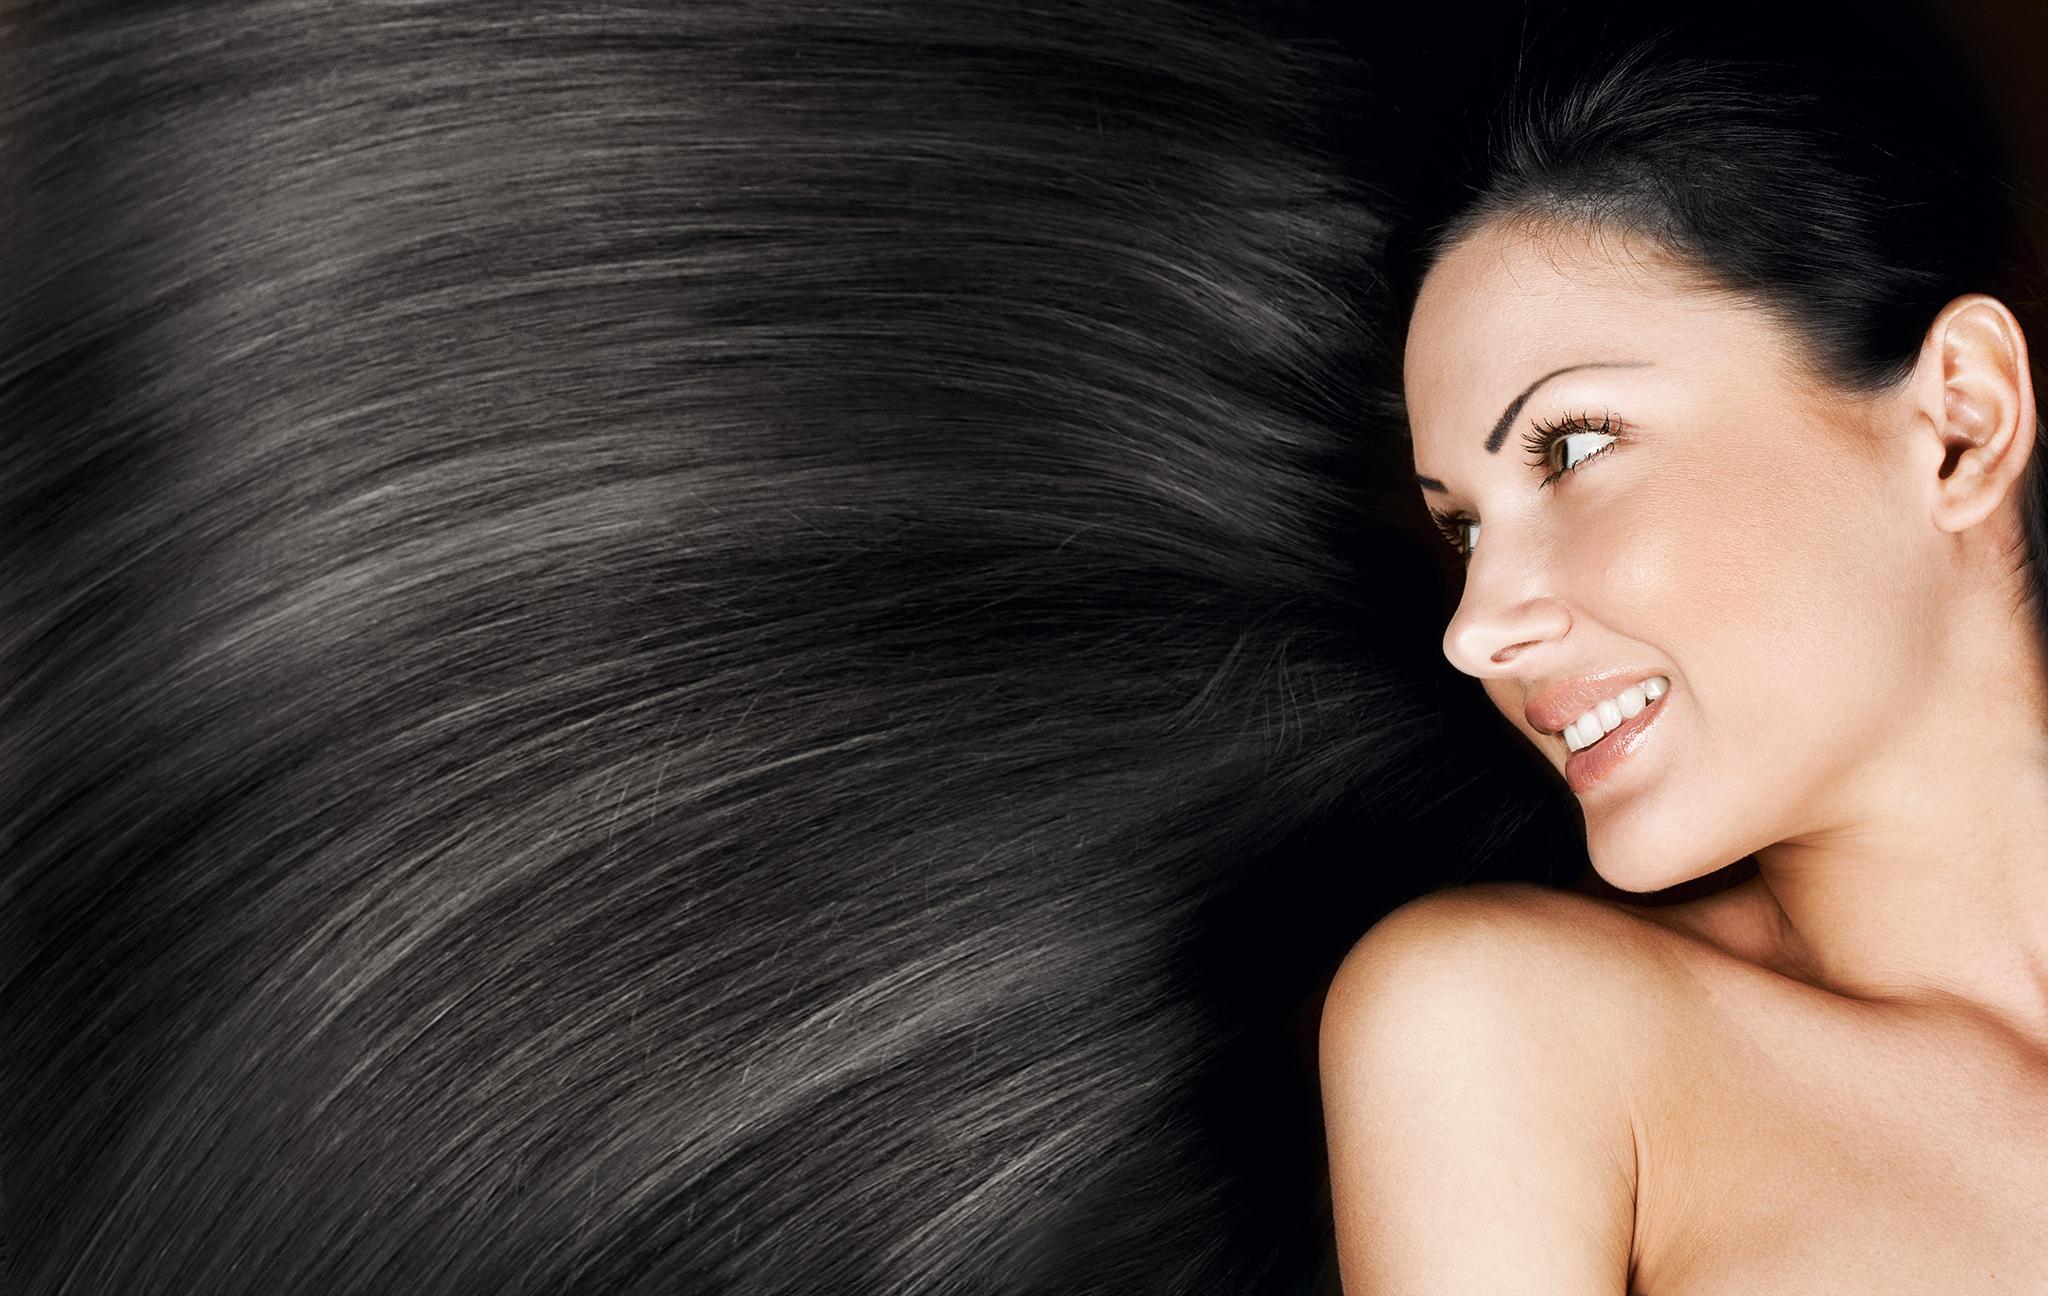 prevent hair loss with Novuhair